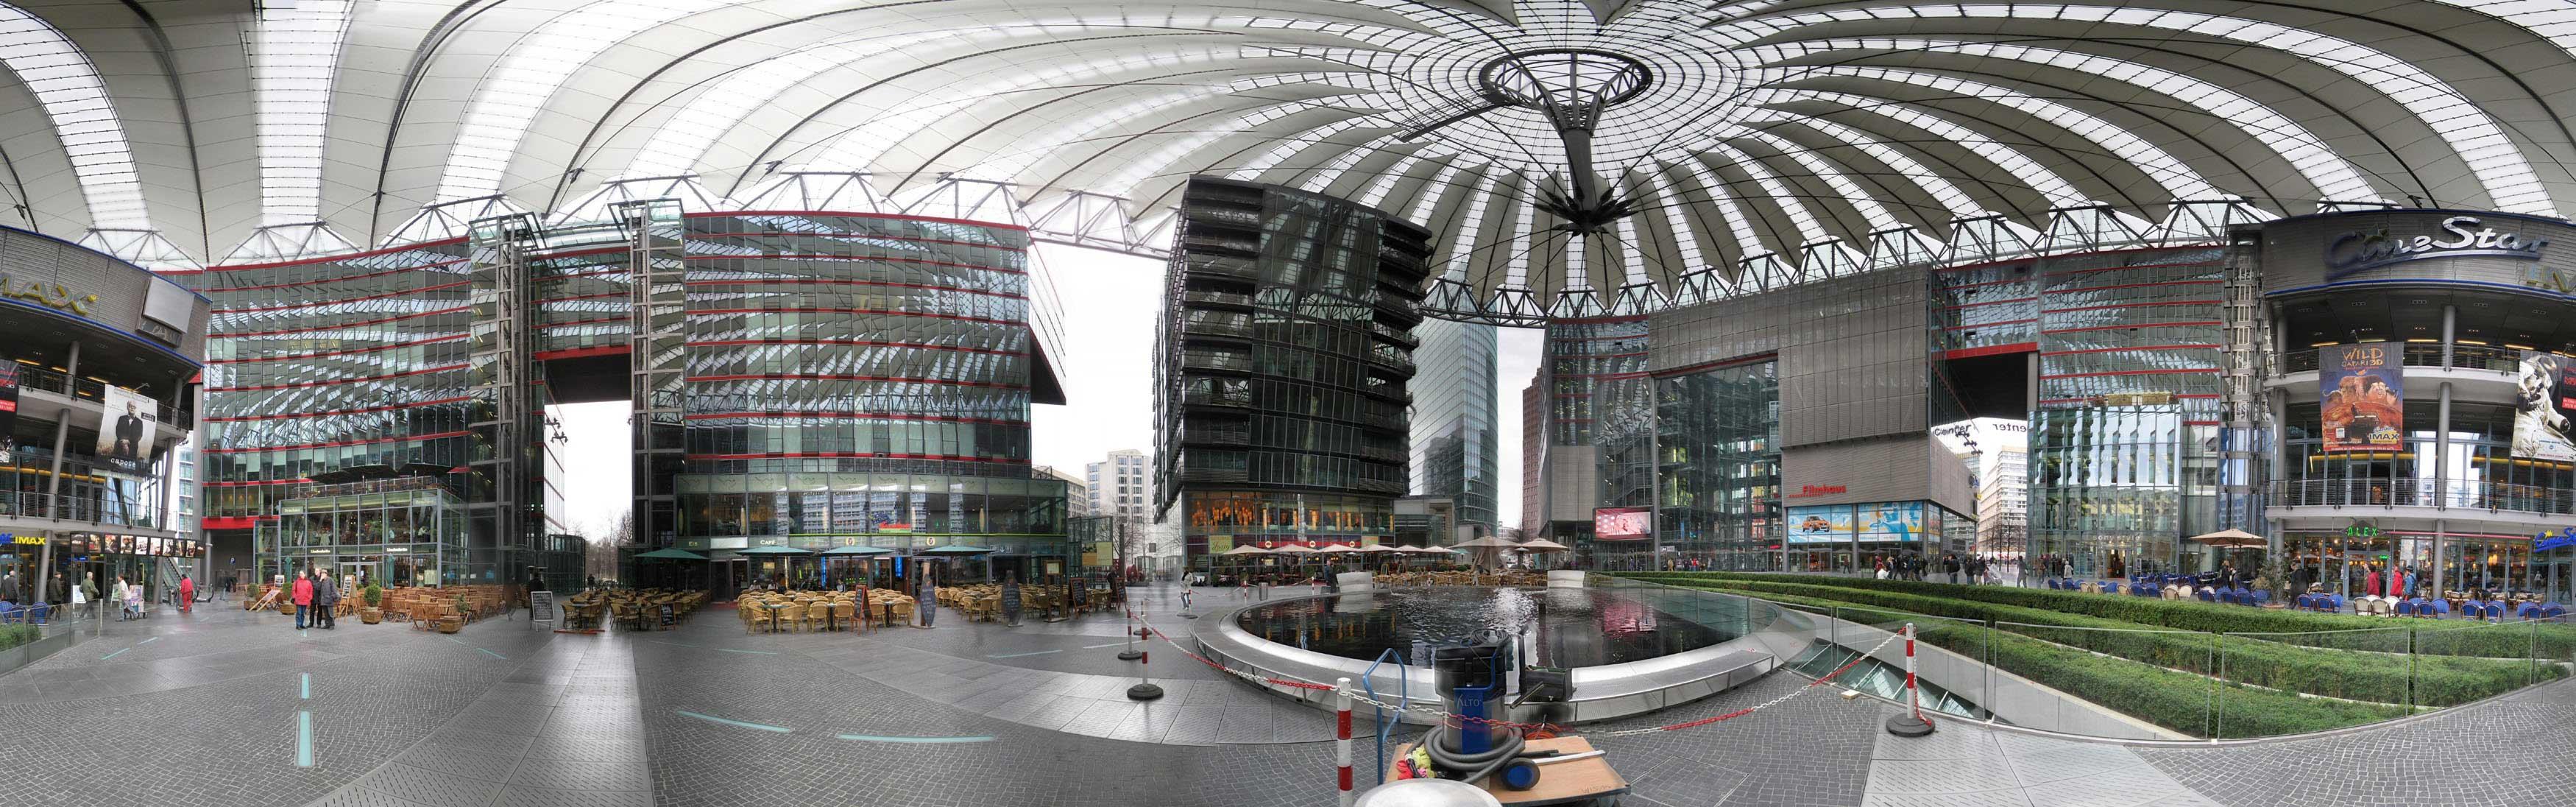 SEO 2017 virtual video